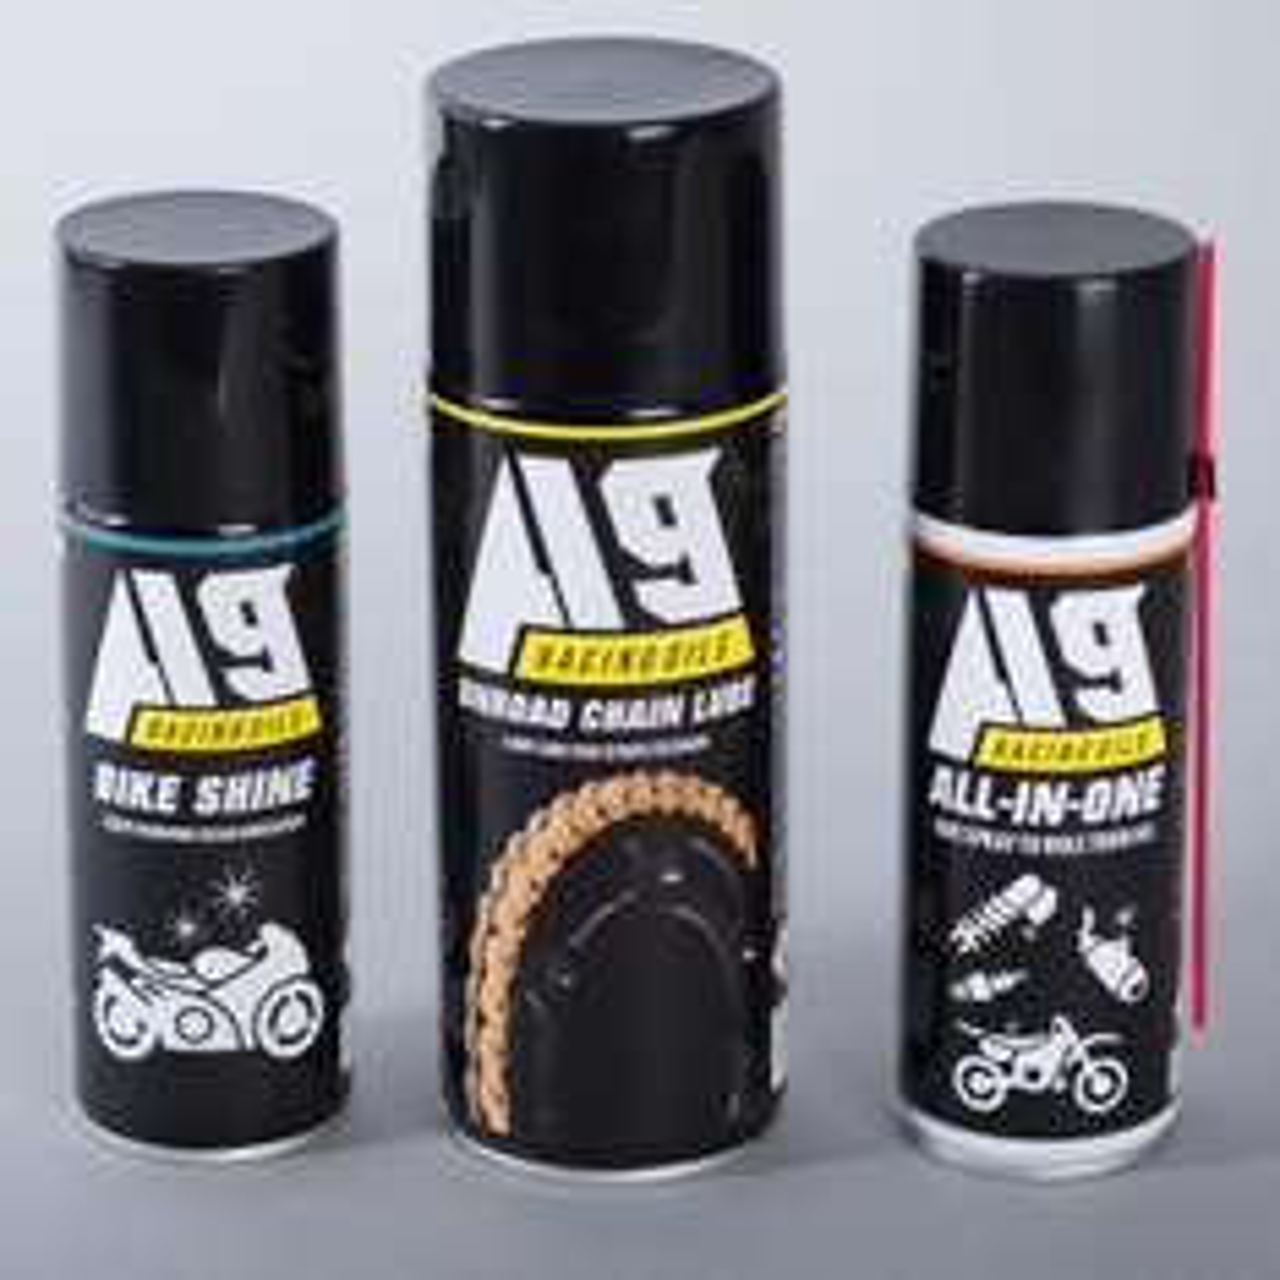 Pack de 3 sprays aérosol : Lubrifiant chaine à sec + Bike Shine + All-in-One